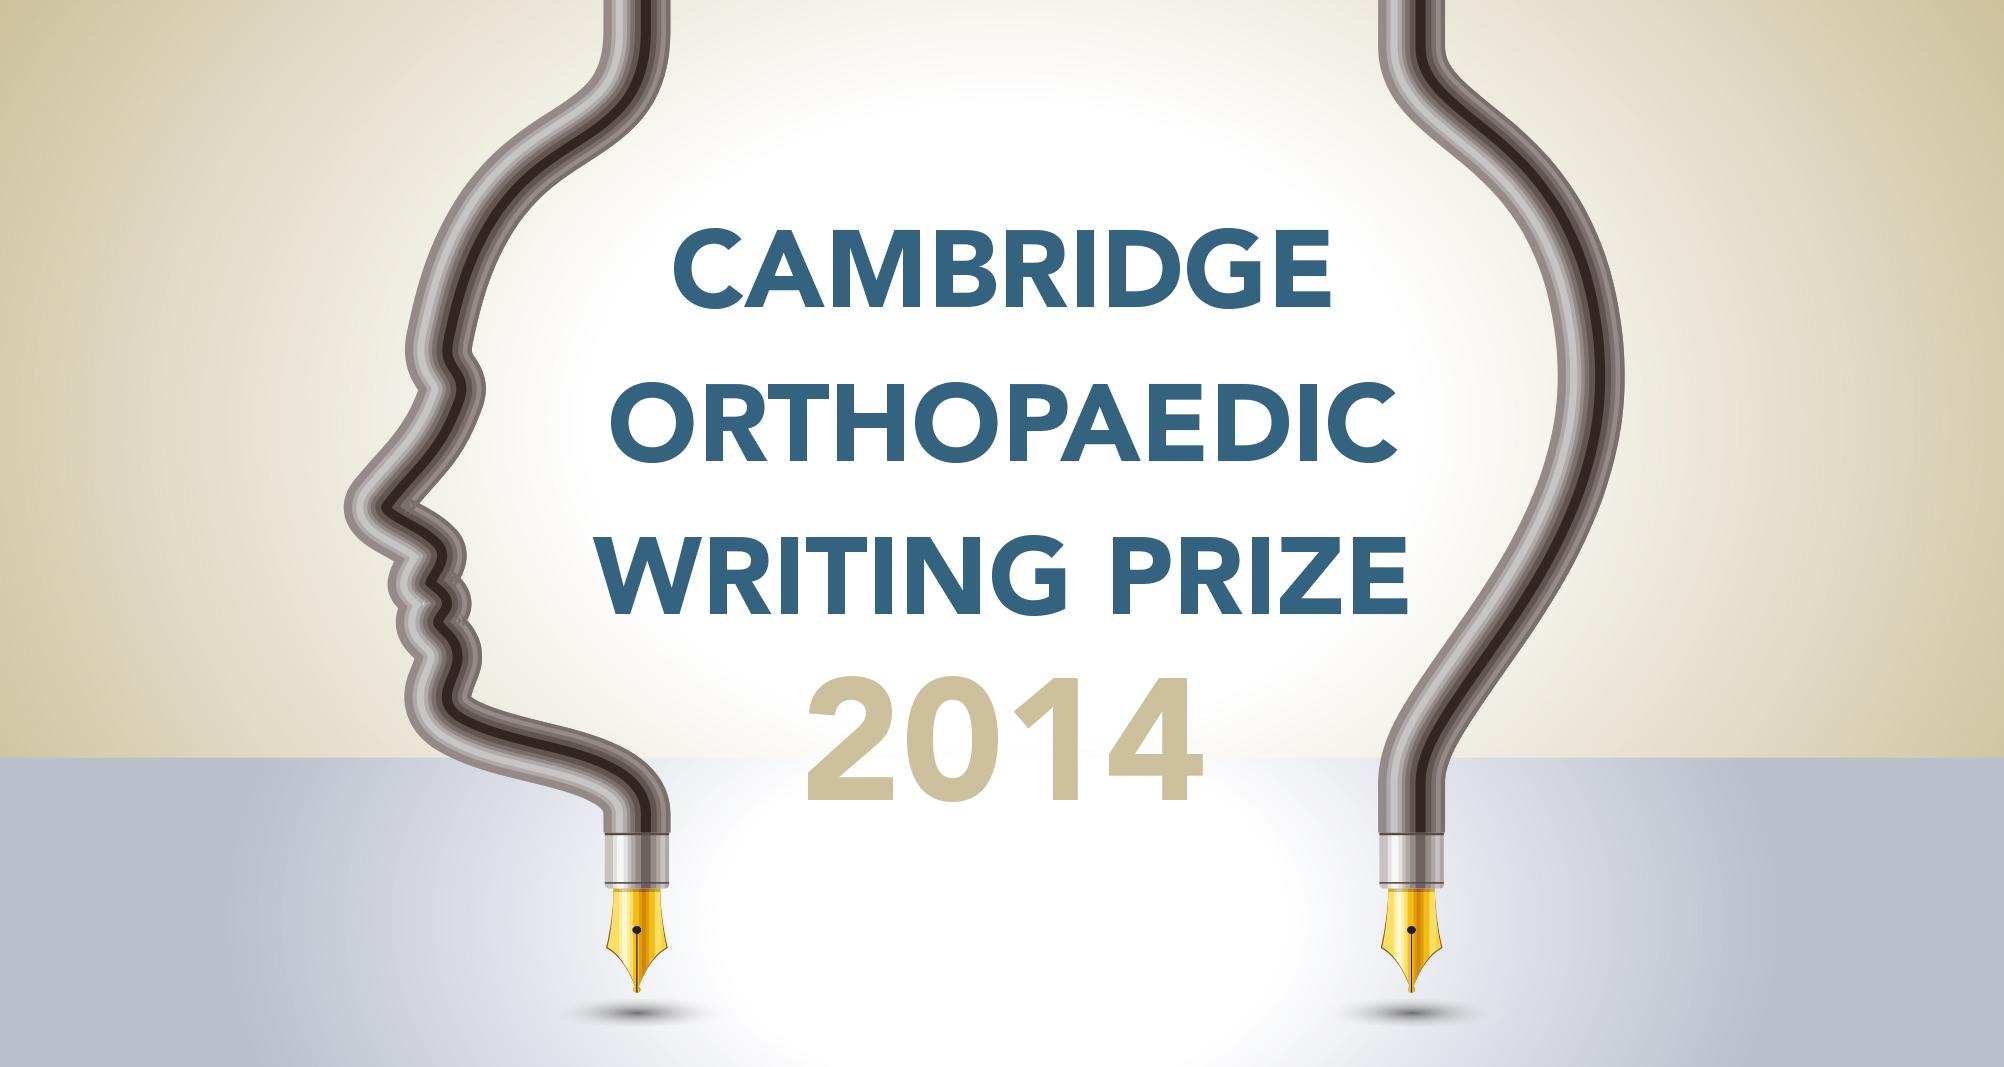 cambridge_orthopaedic_writing_prize_2014